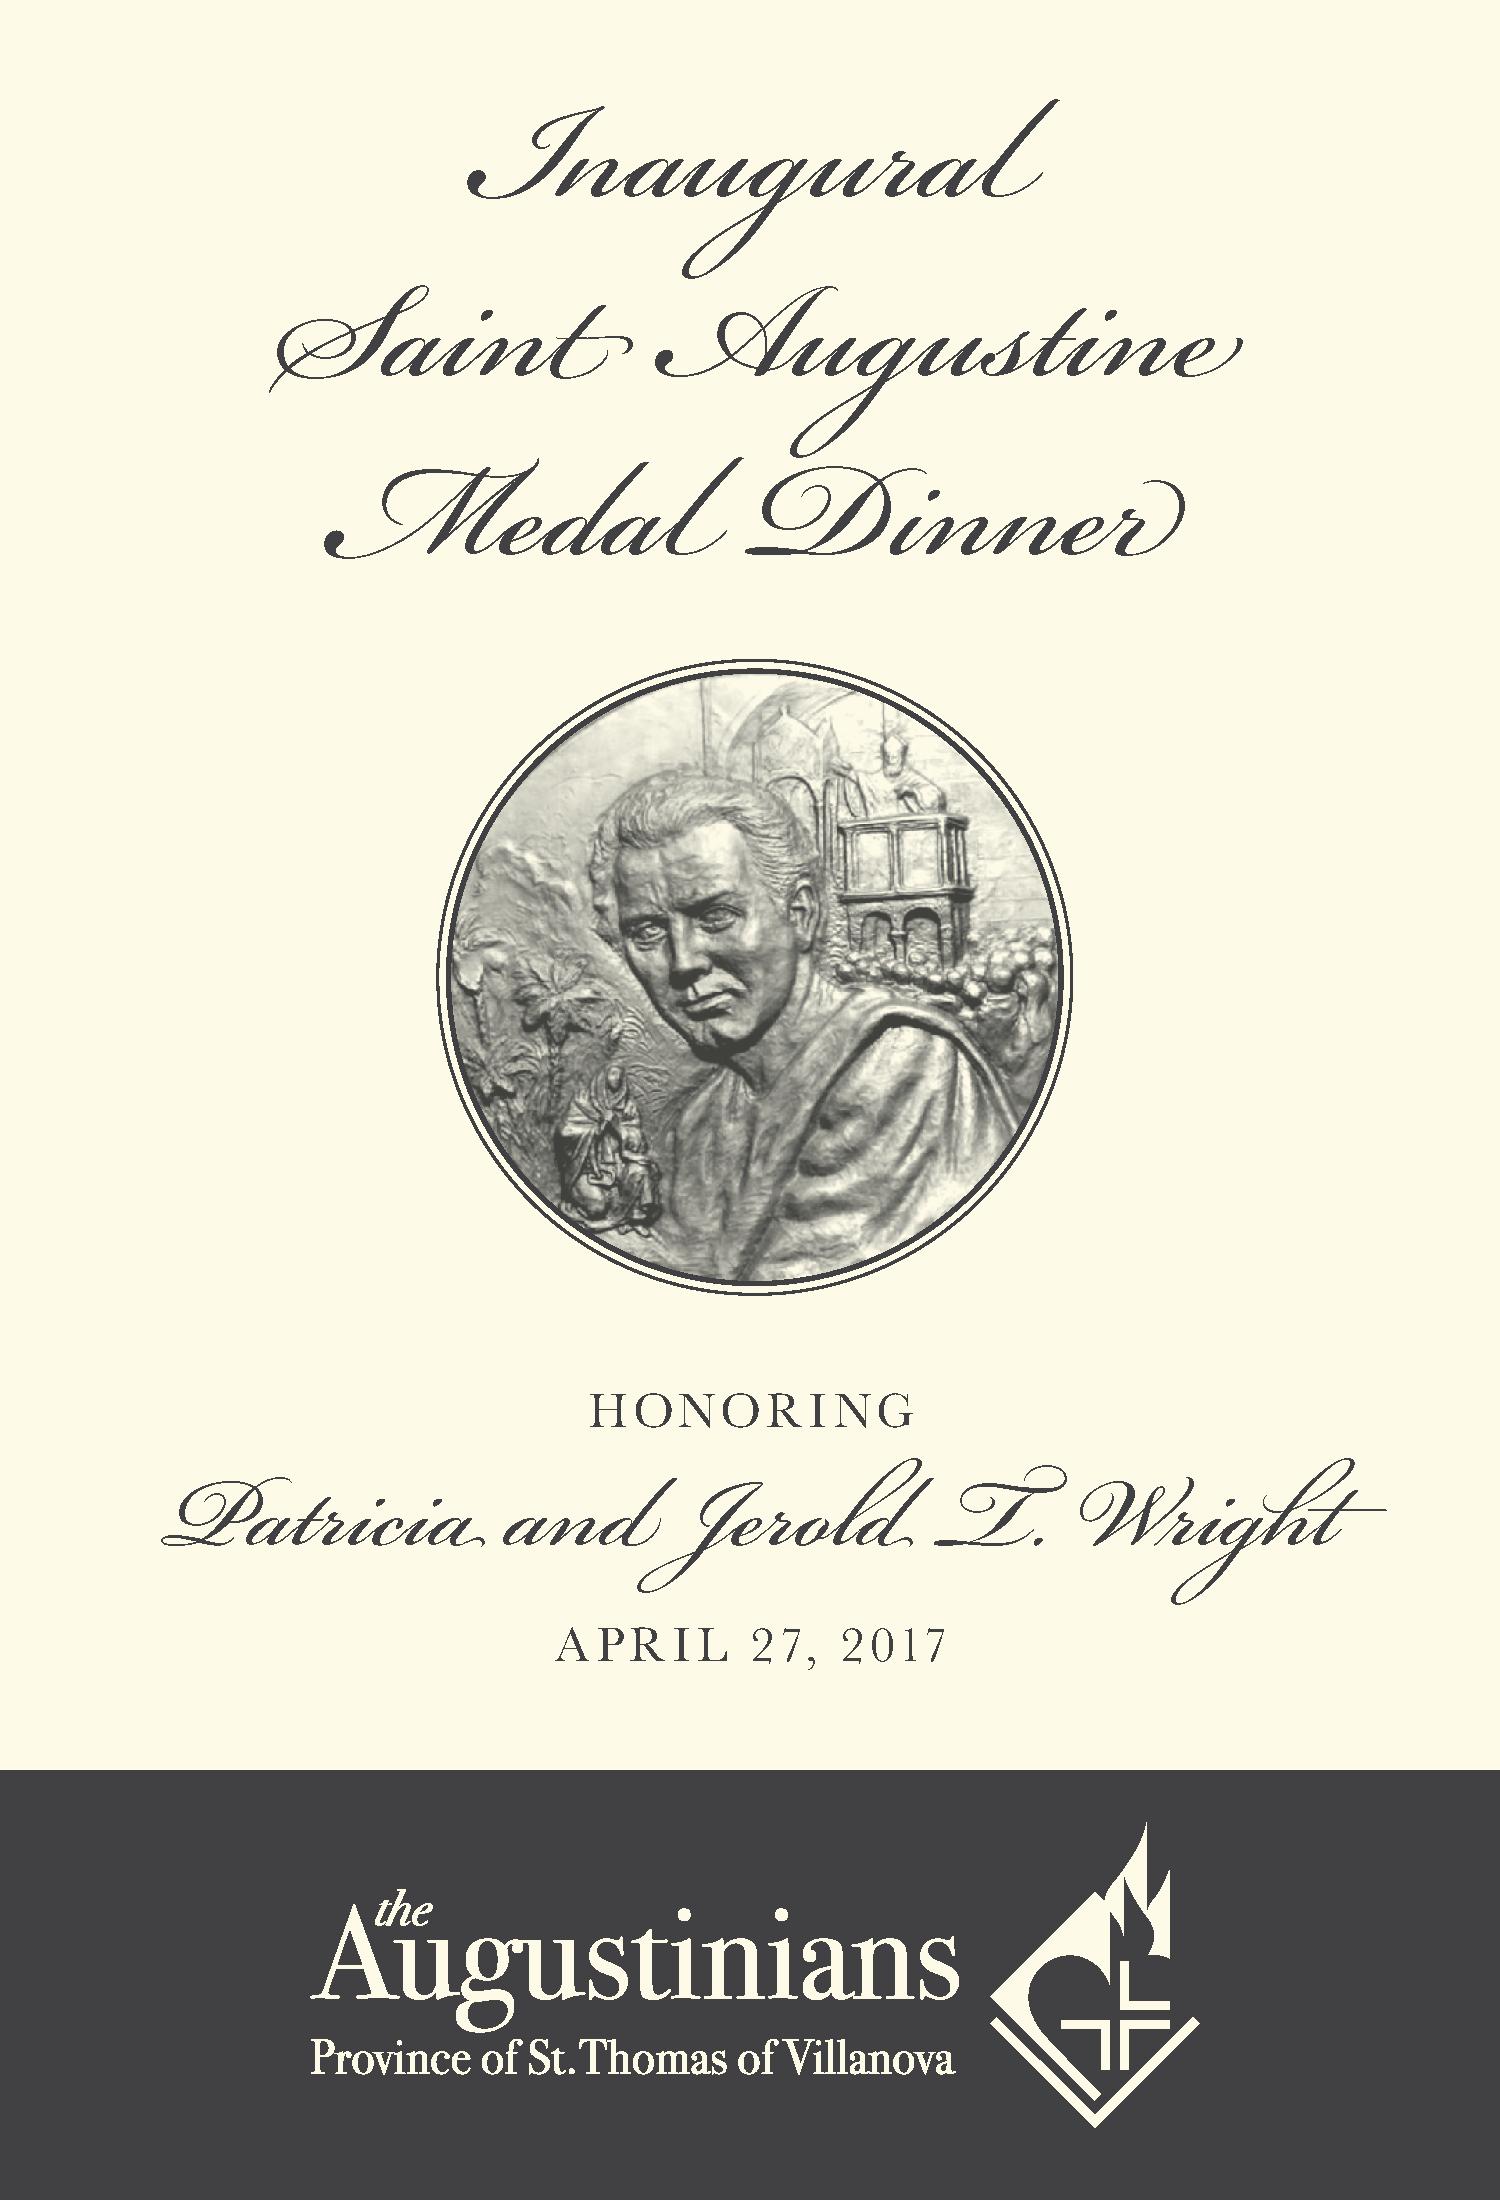 2017 Saint Augustine Medal Dinner